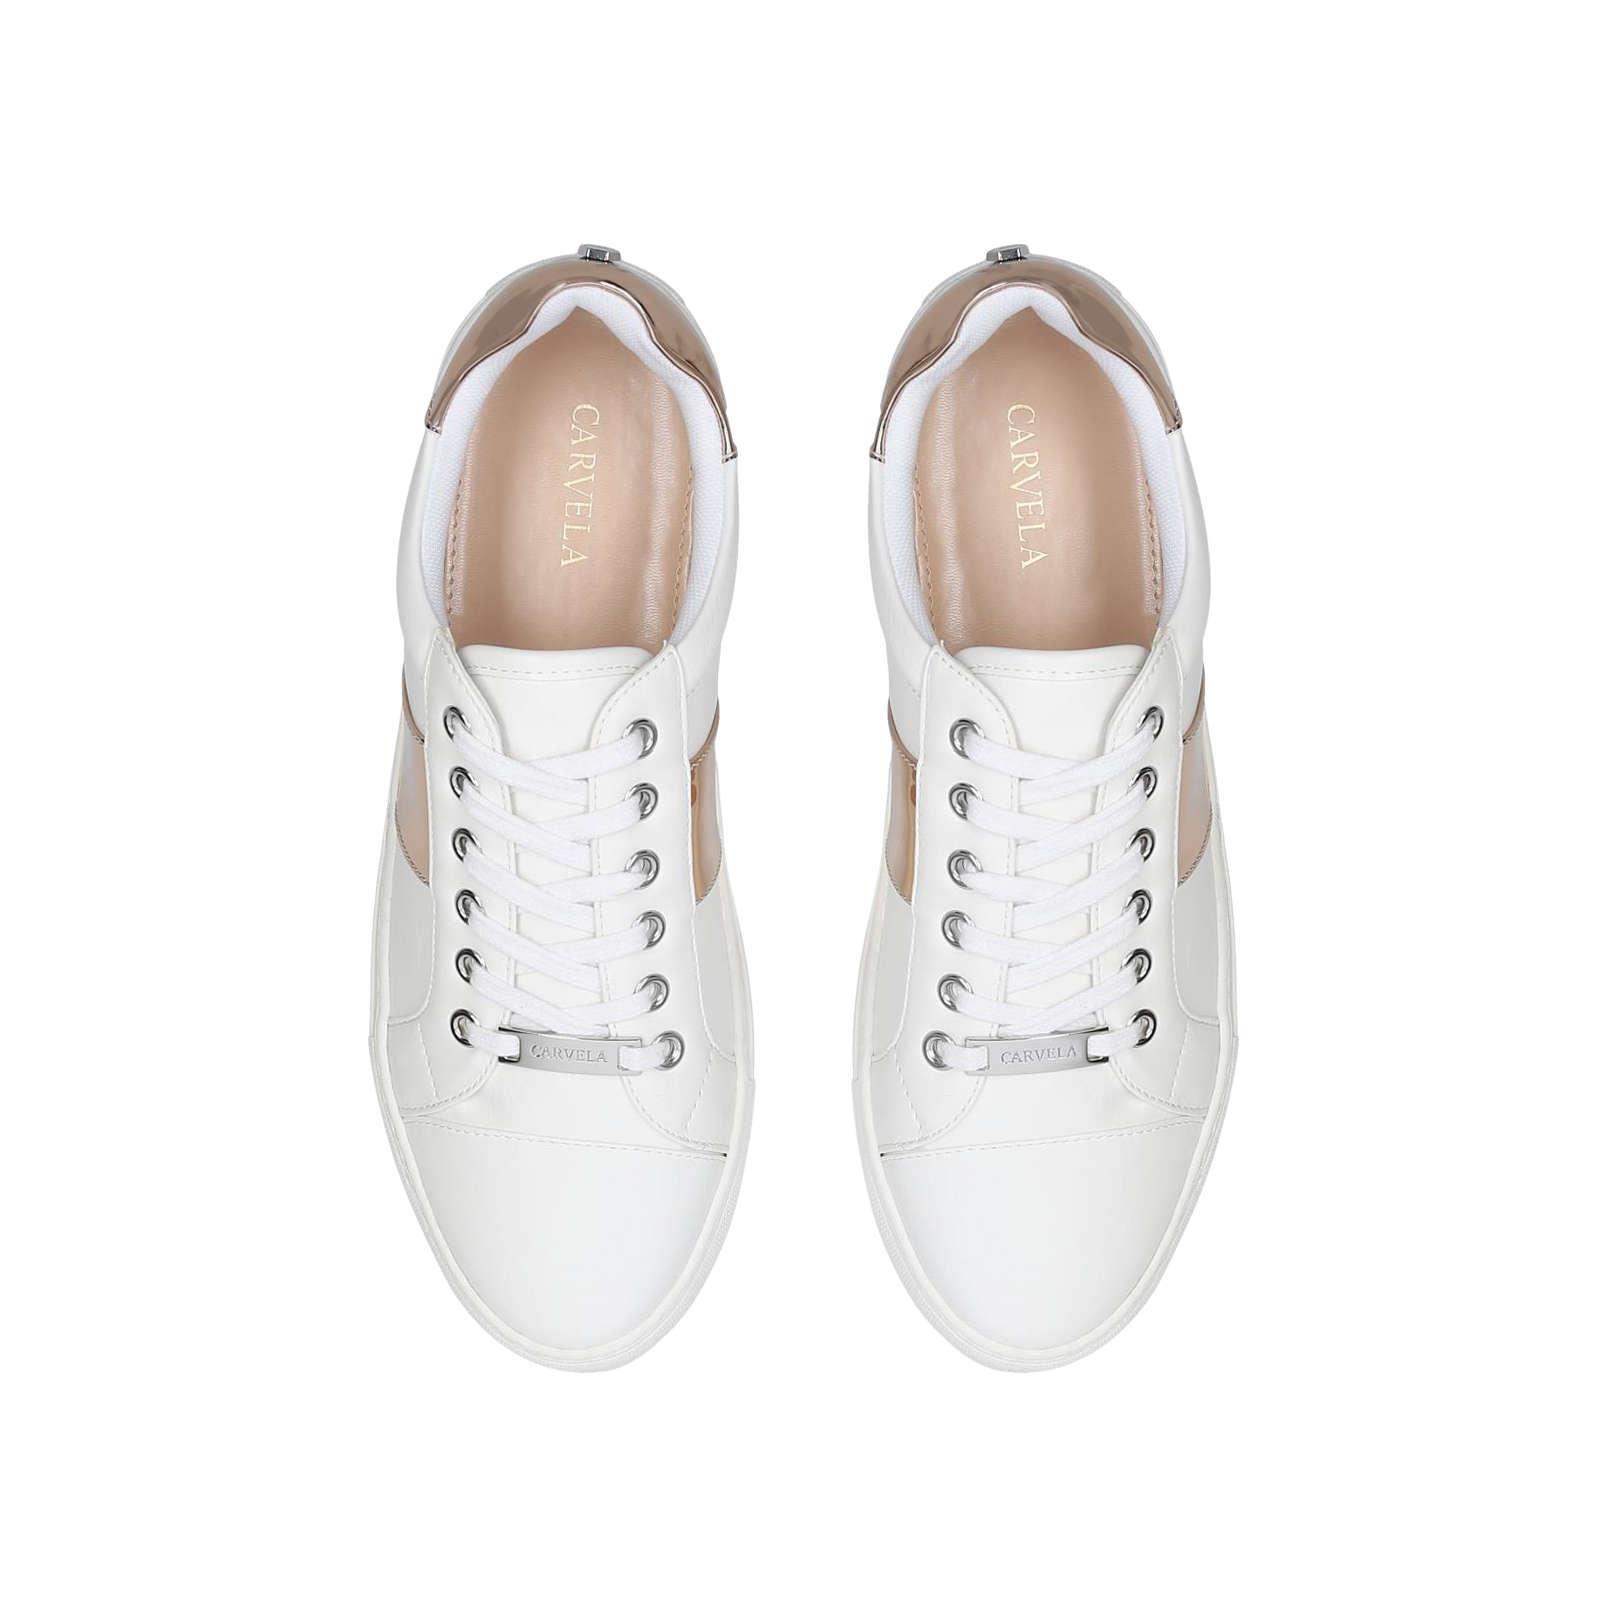 JACUZZI - CARVELA Sneakers